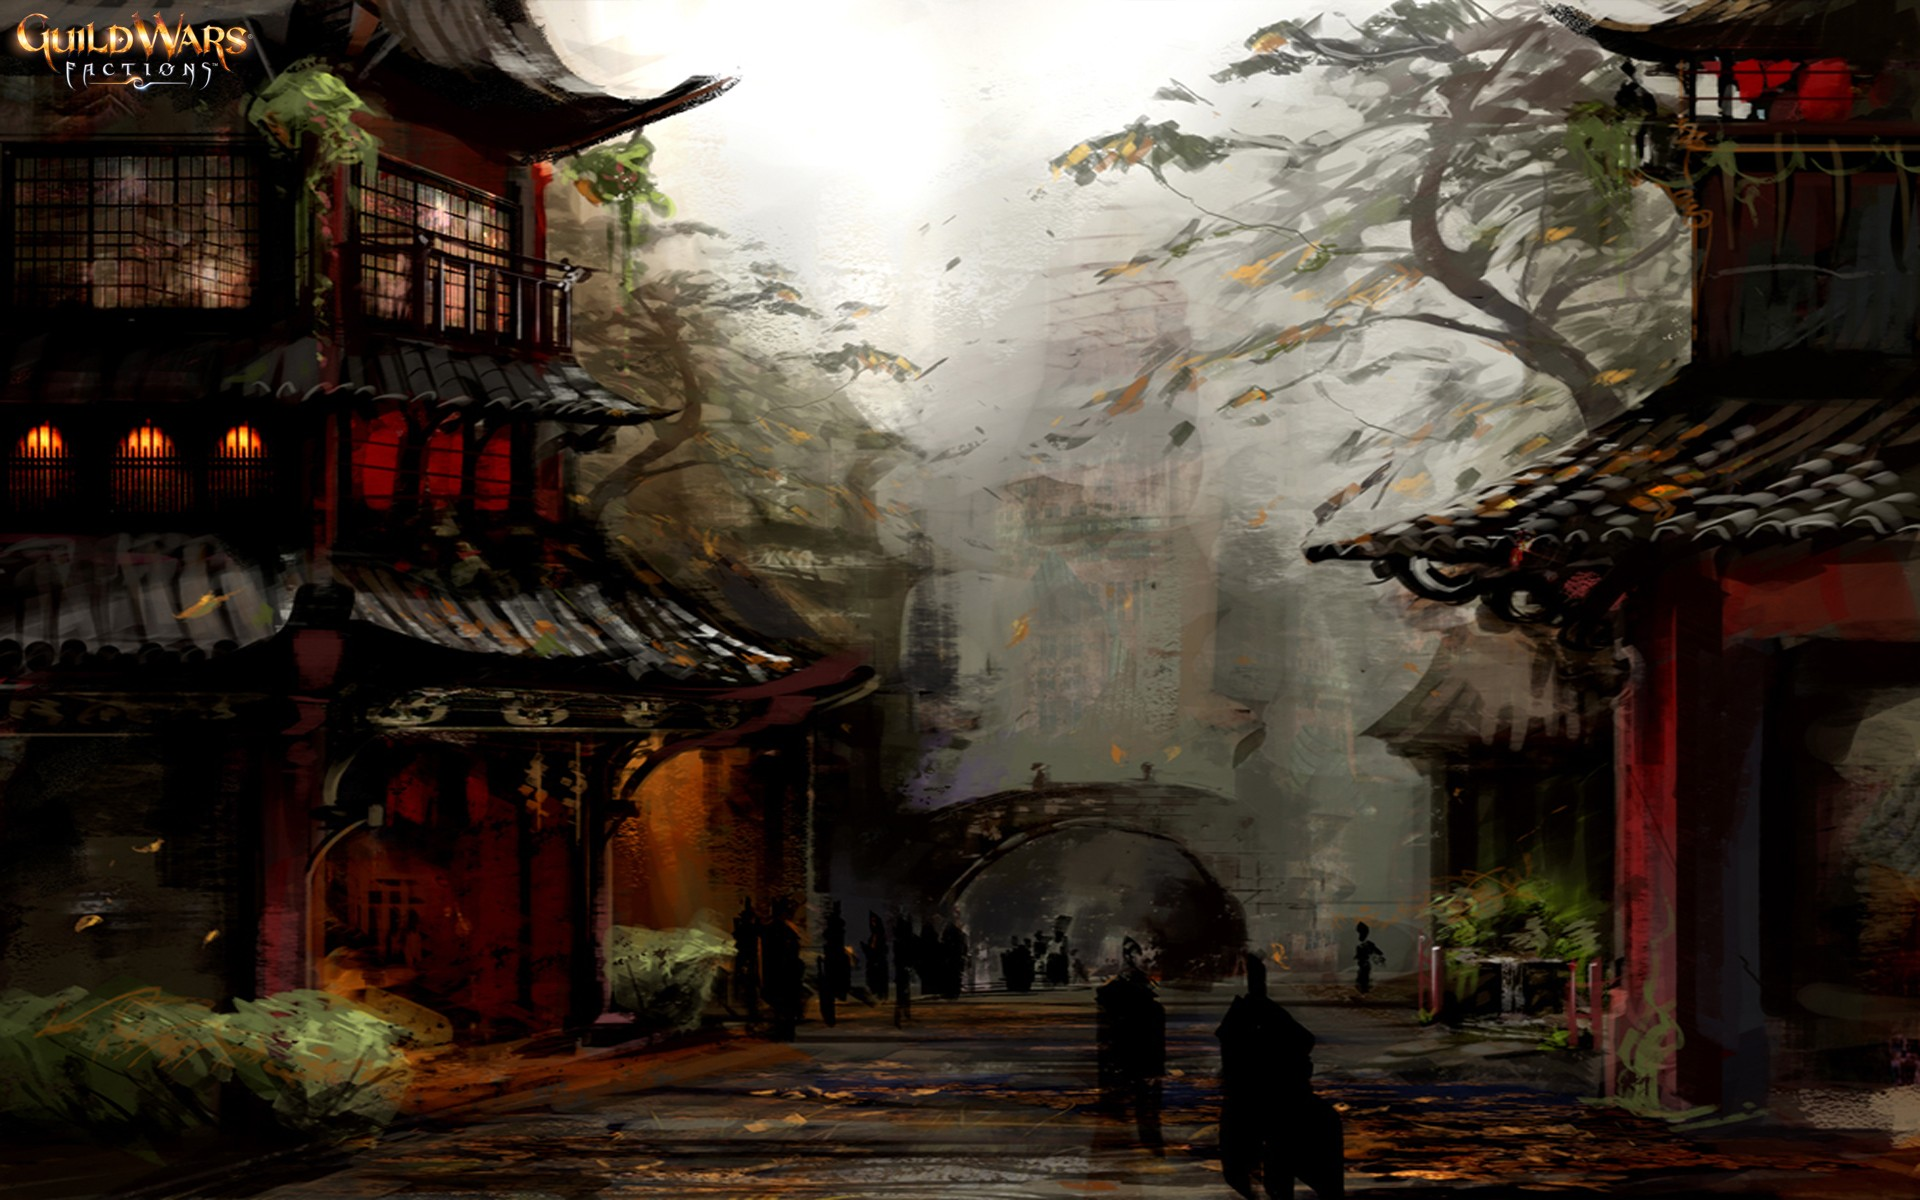 China wallpaper hd New Blog 1920x1200